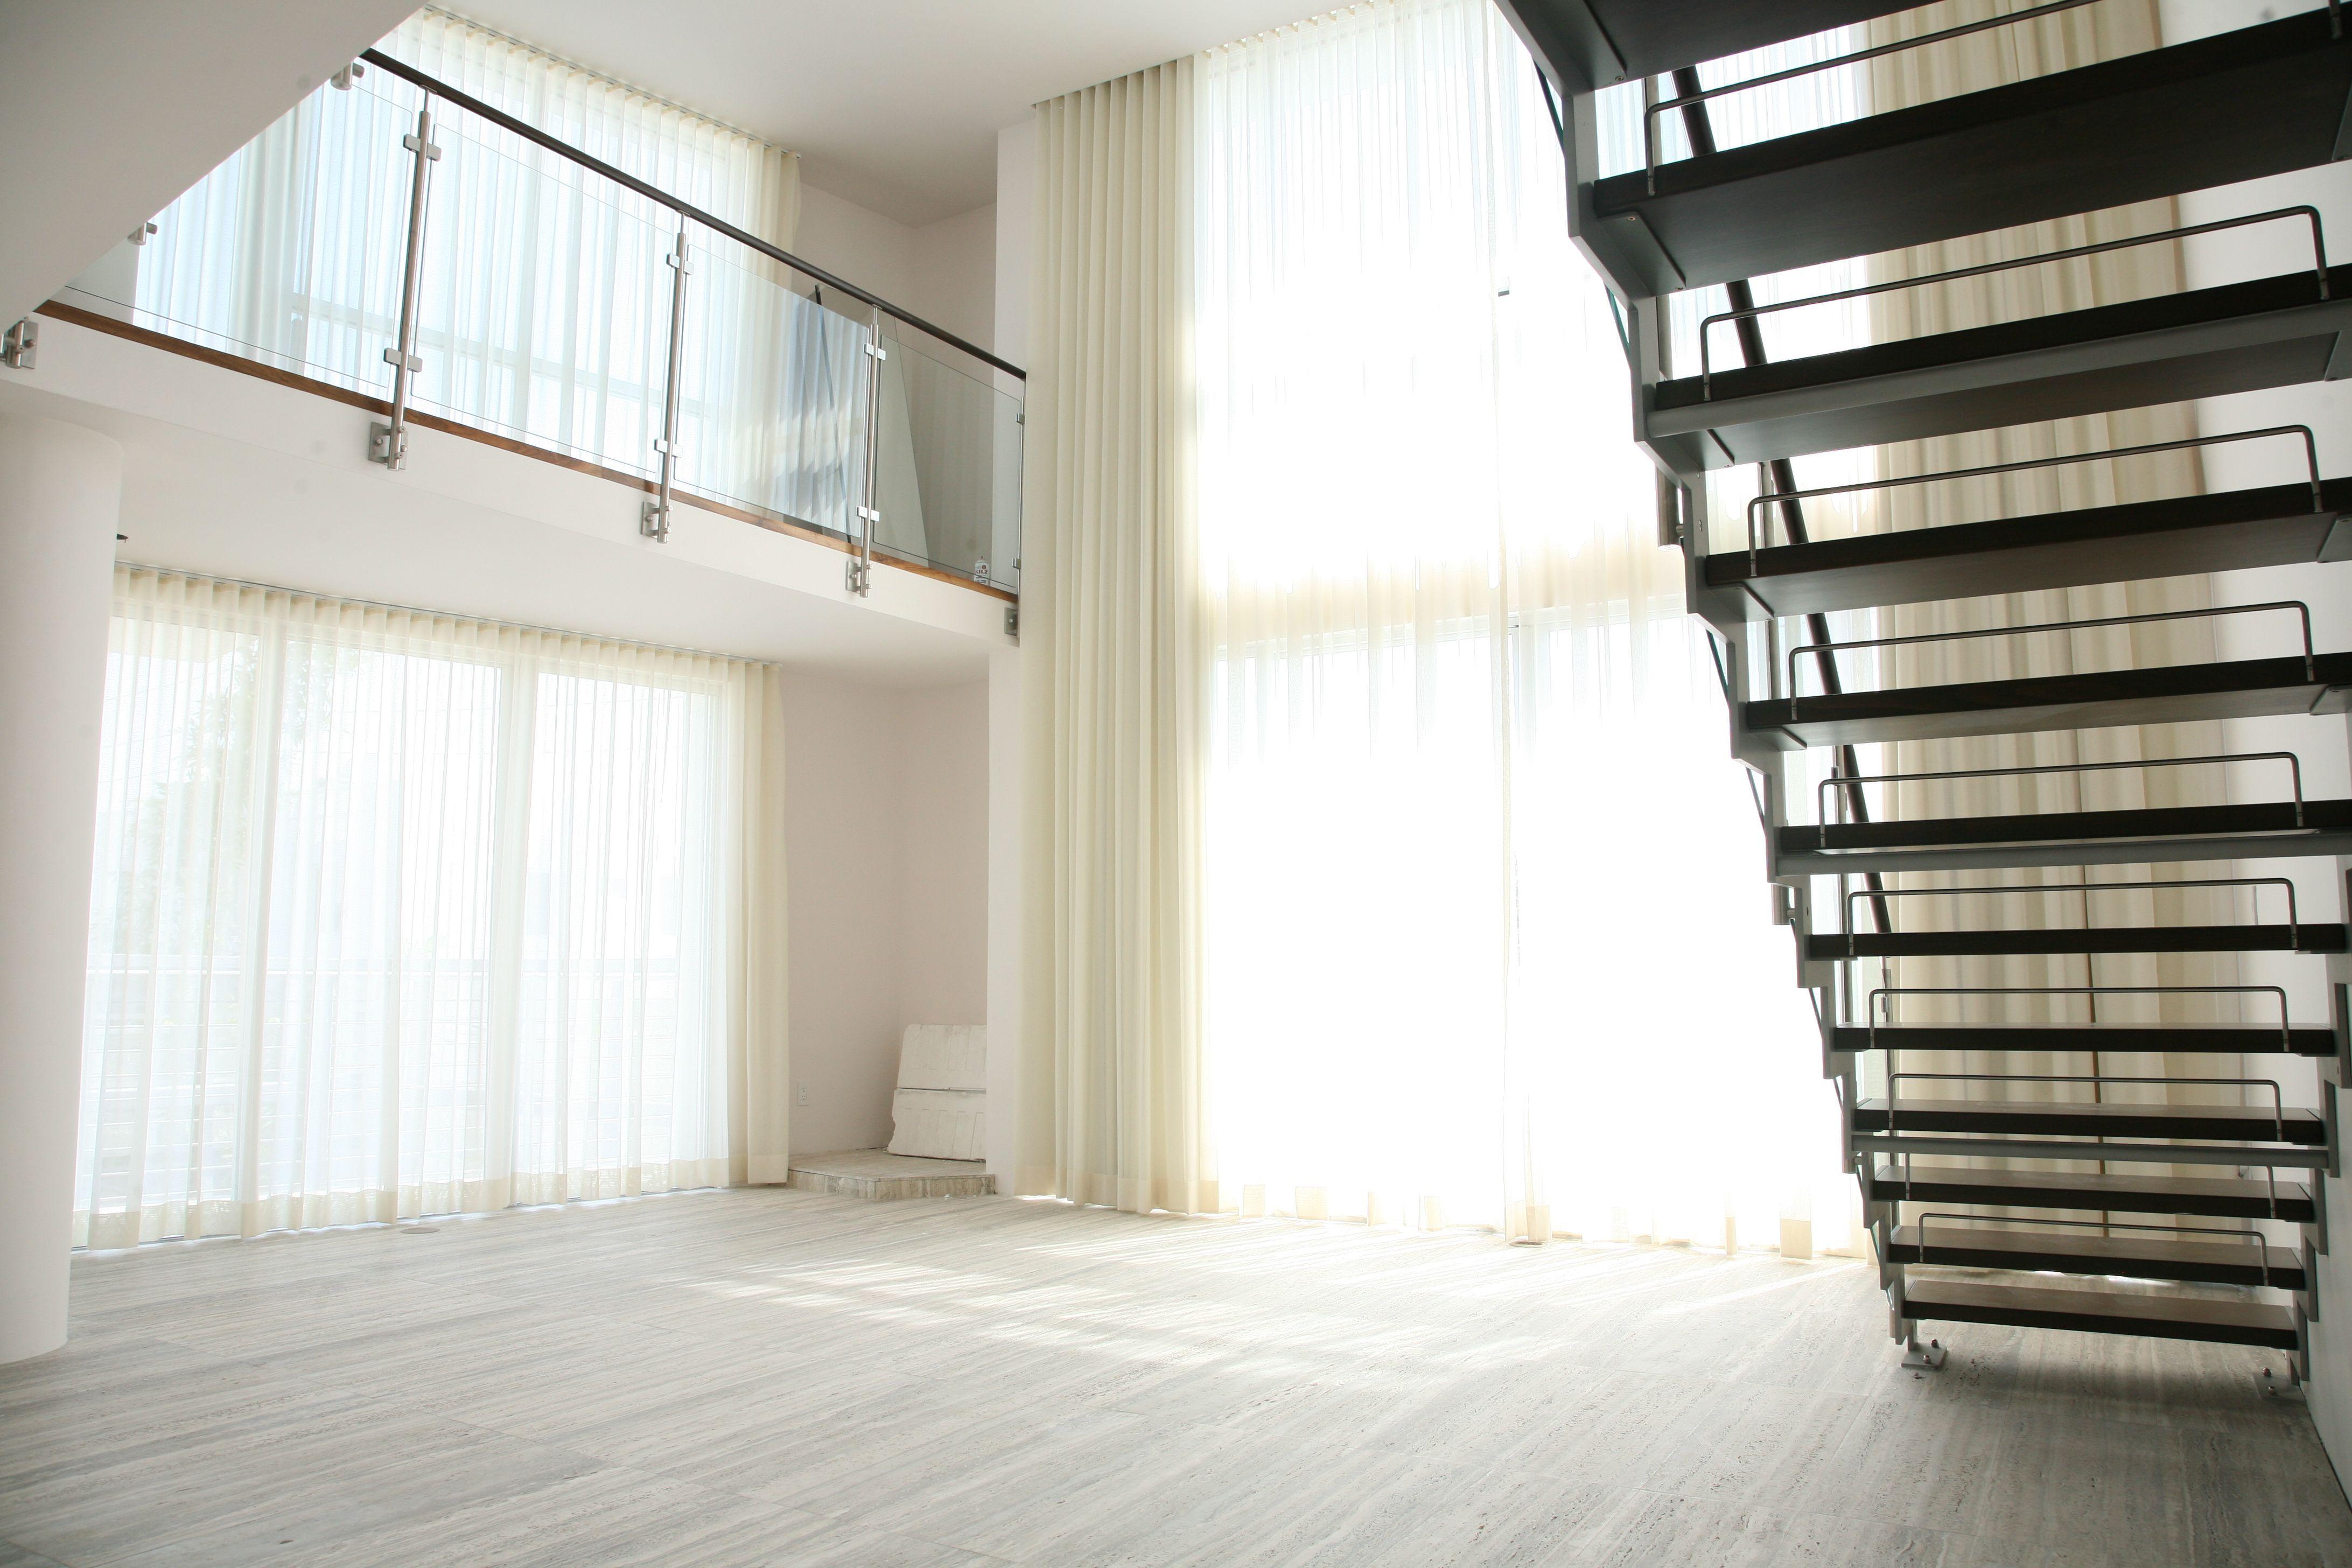 Stairs & Railings by Boudreaux Design Studio | Best ...